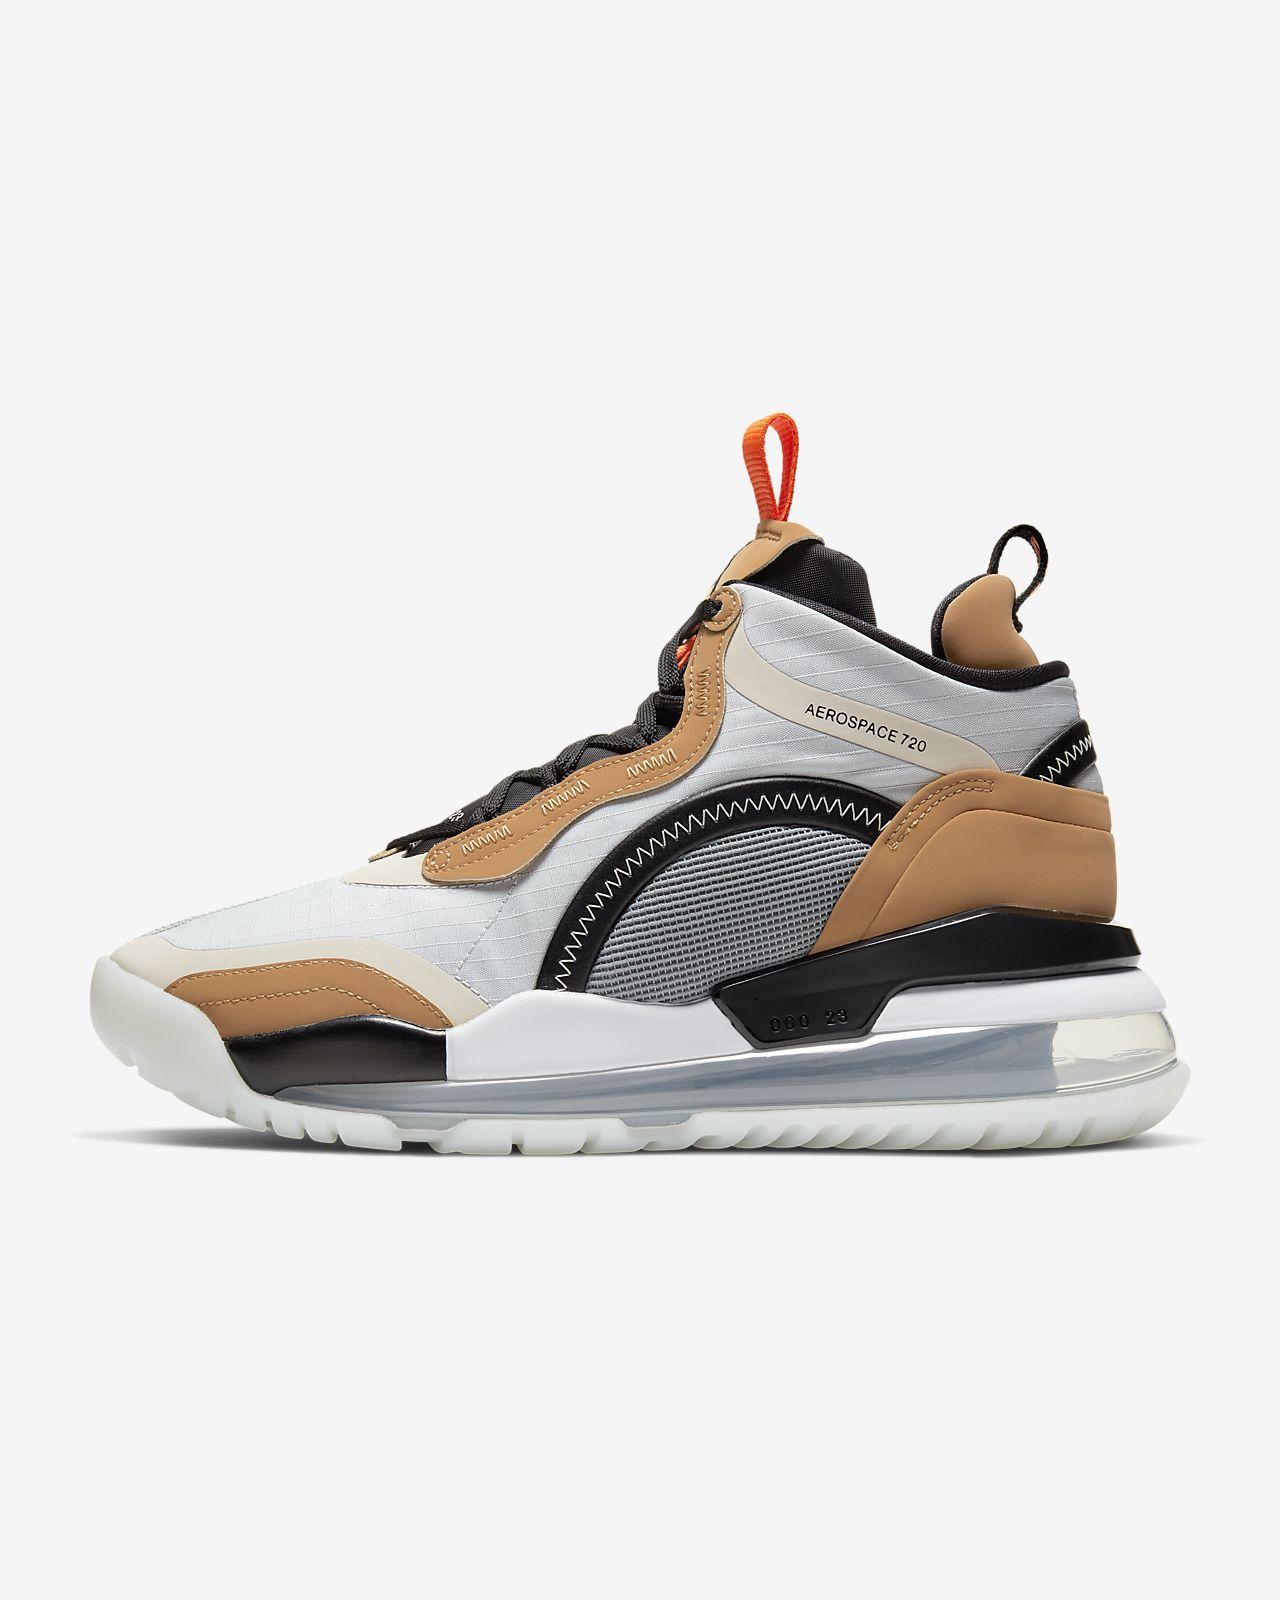 Jordan Aerospace 720 sko til herre